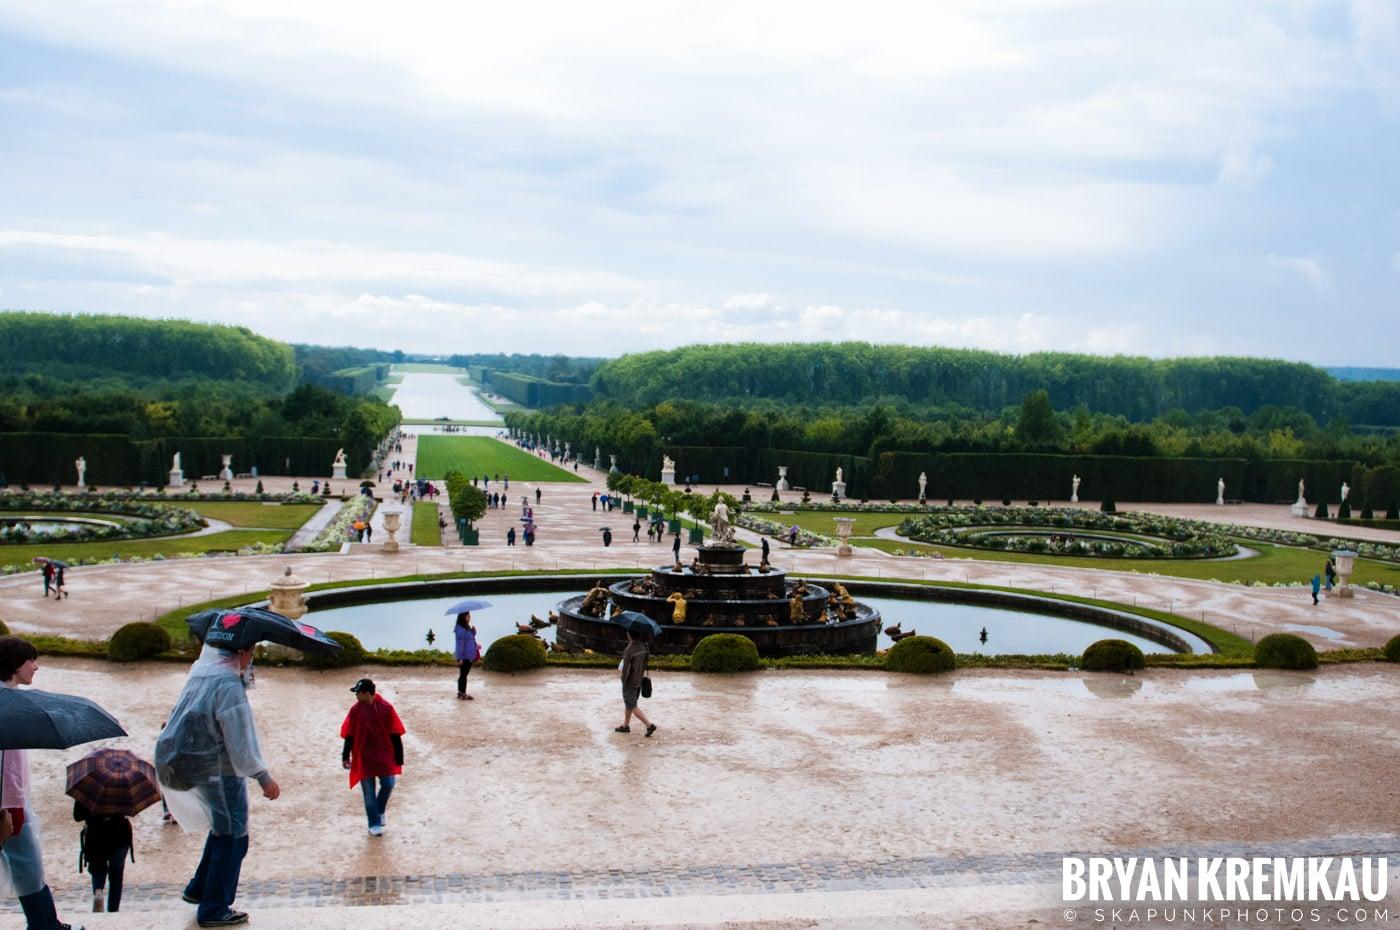 Paris, France Honeymoon - Day 2 - 7.19.11 (12)